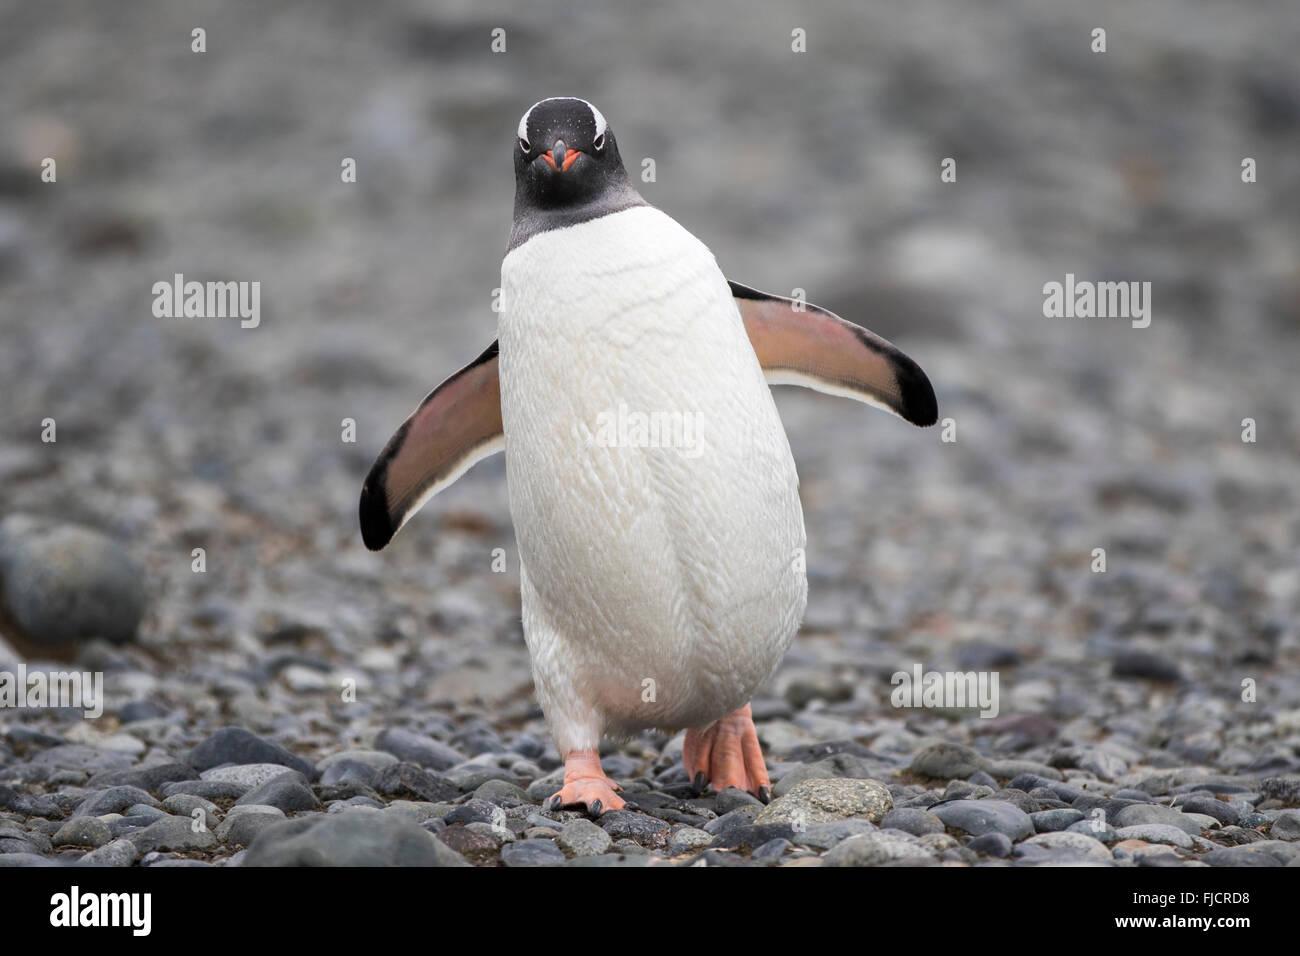 Antarctica penguin, penguins, Antarctic. Gentoo penguins (Pygoscelis papua). - Stock Image